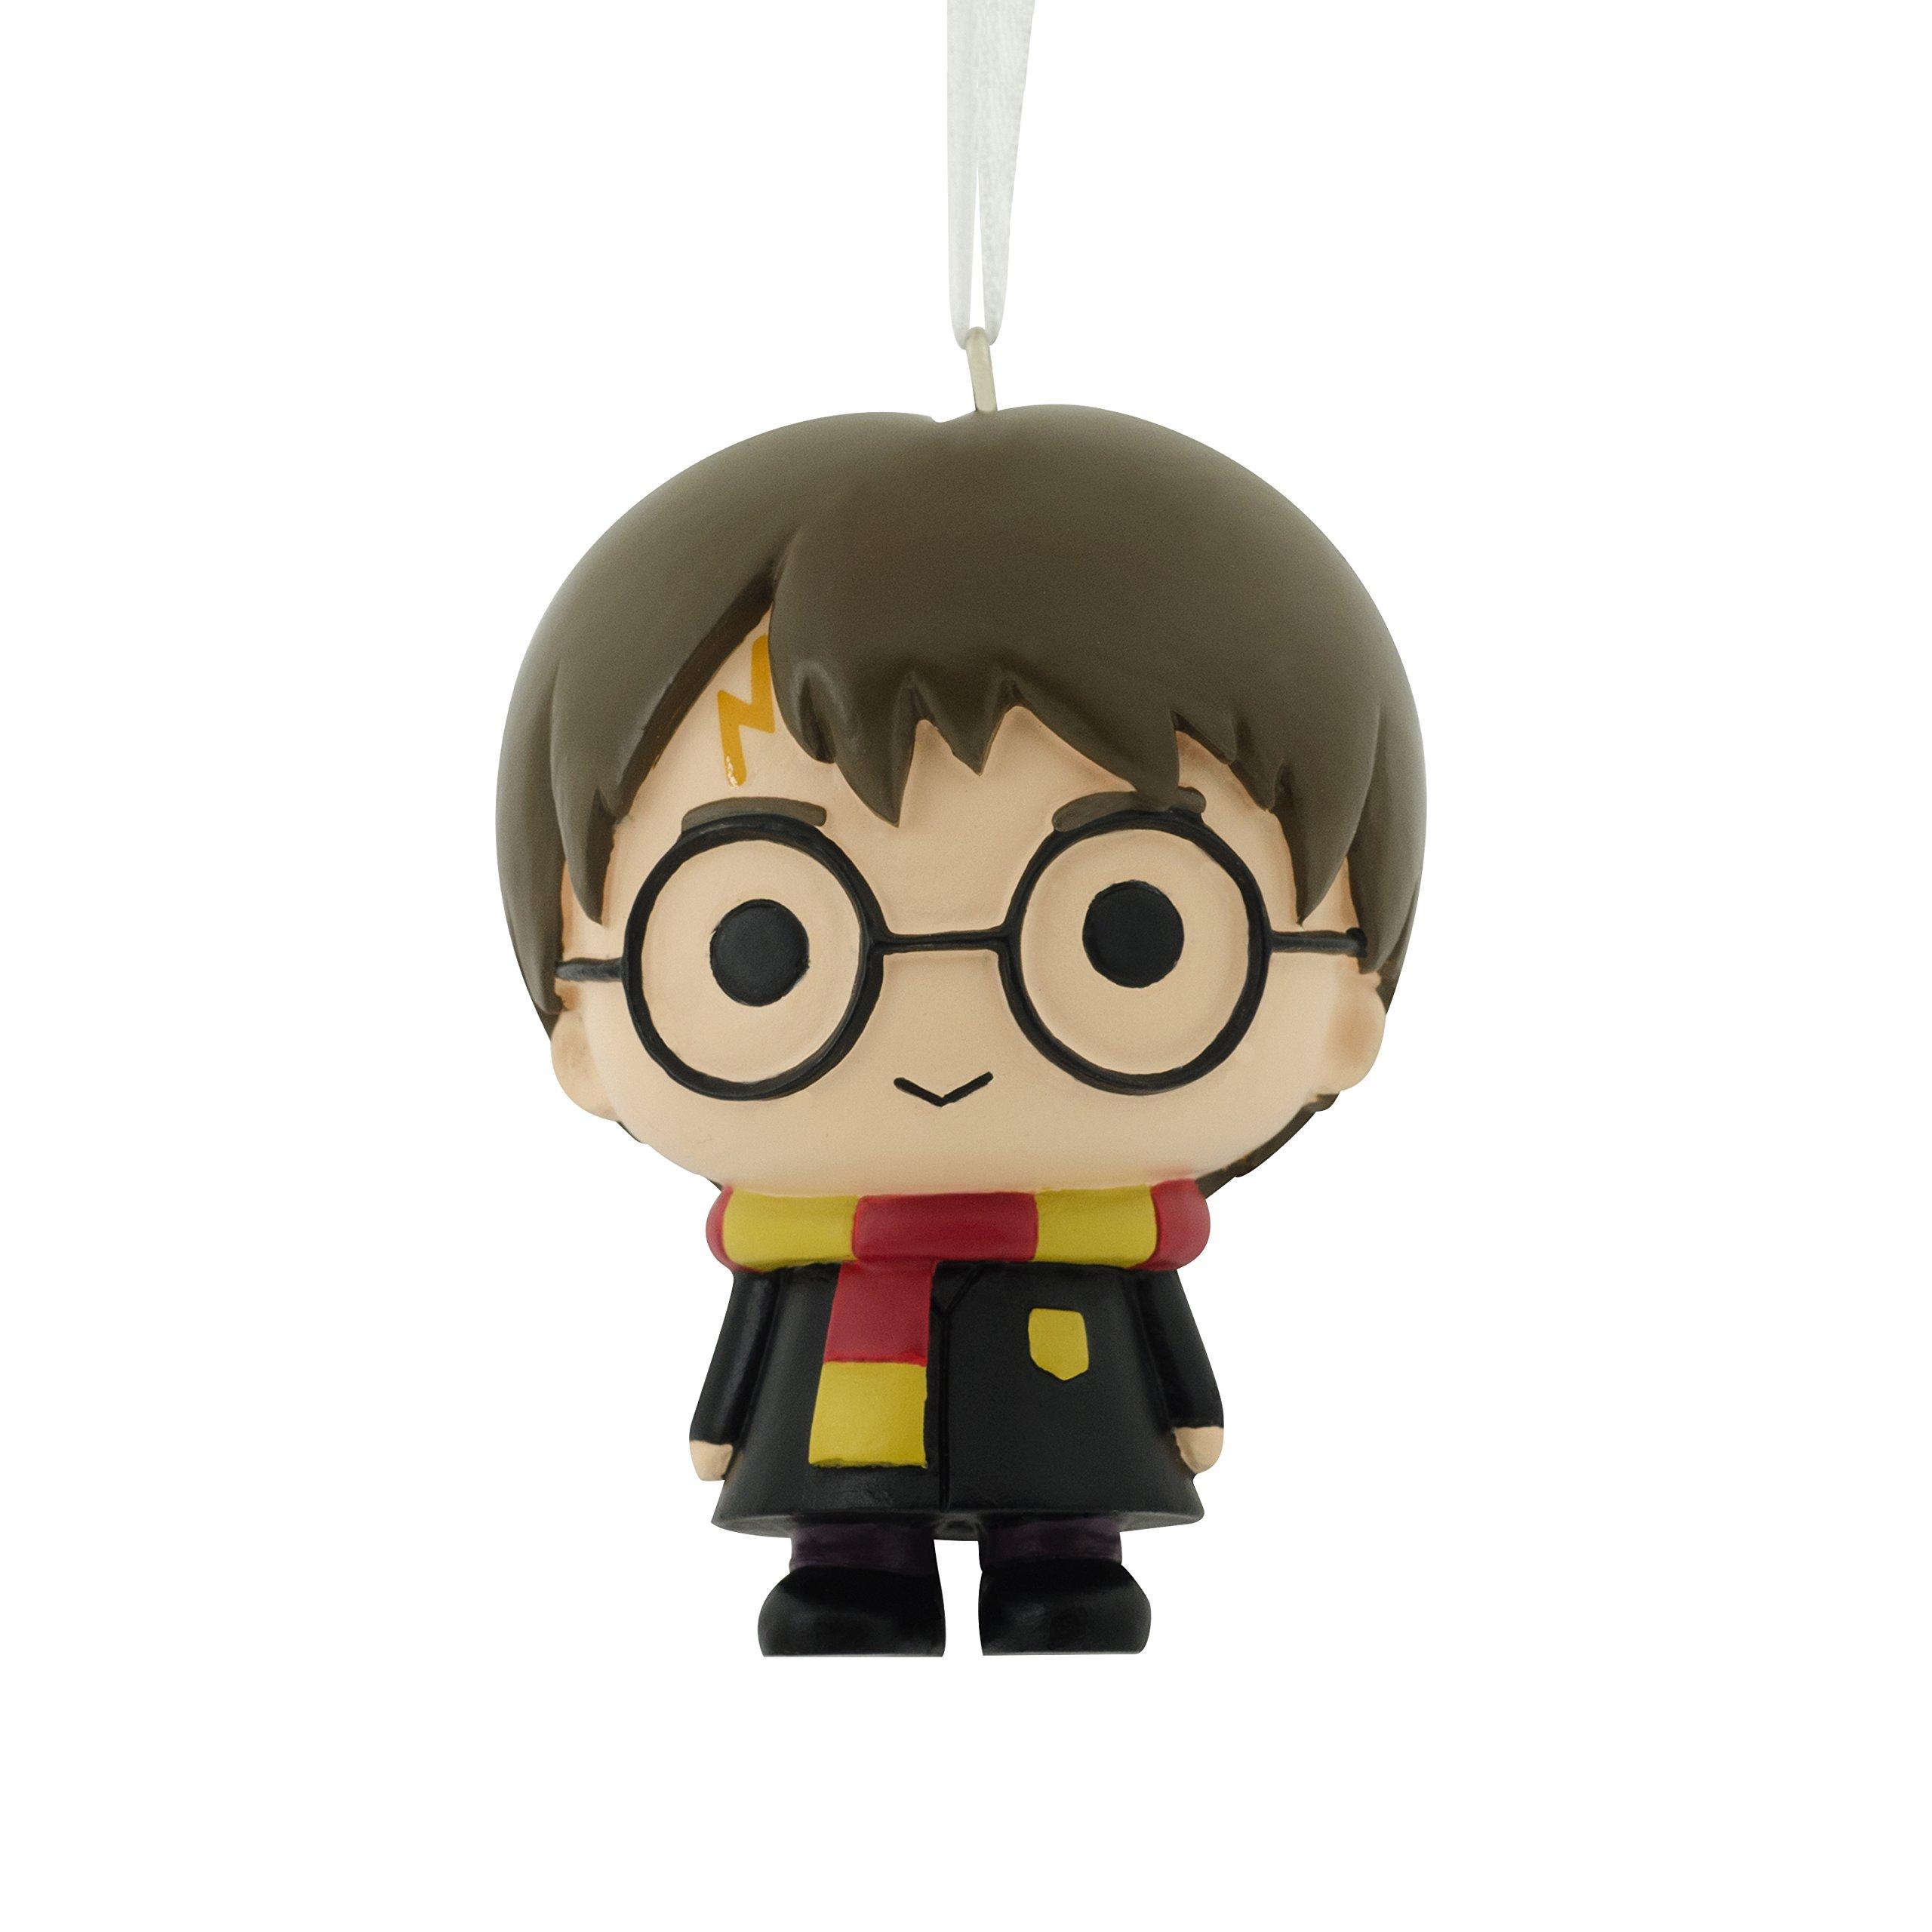 Hallmark Christmas Ornament Harry Potter Resin Figure Gift